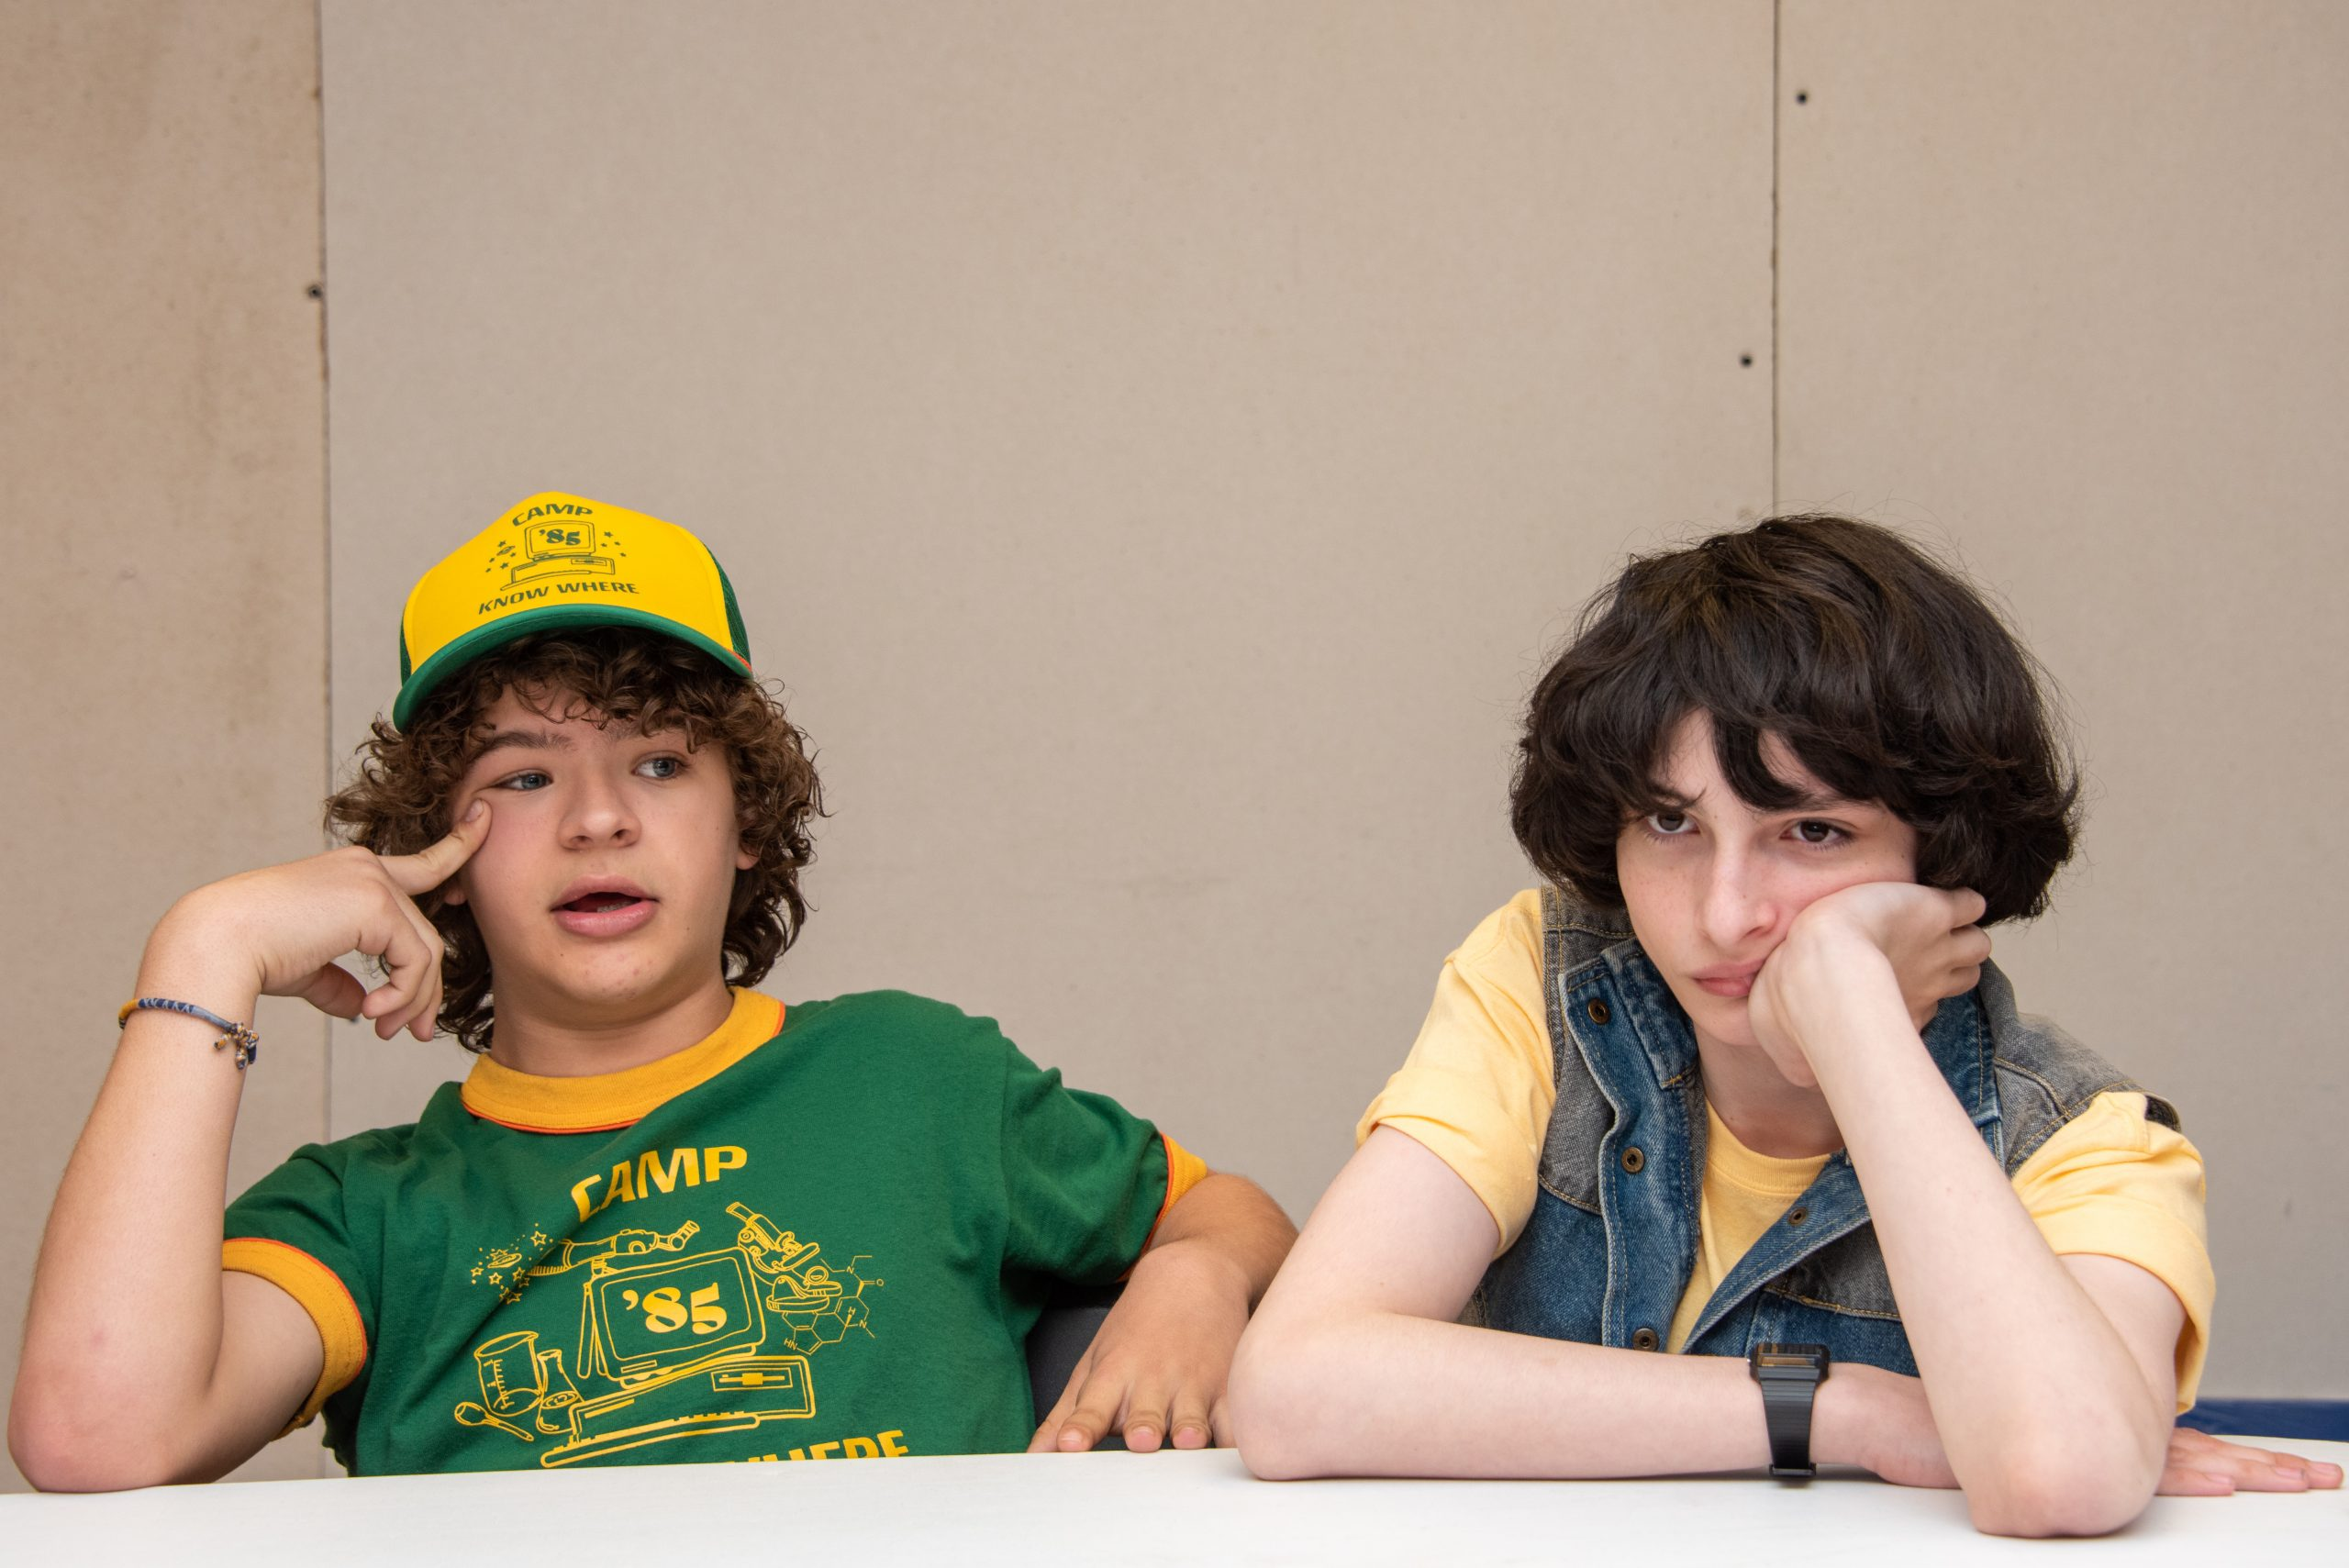 Gaten Matarazzo de 'Stranger Things' trabaja como mesero durante la cuarentena